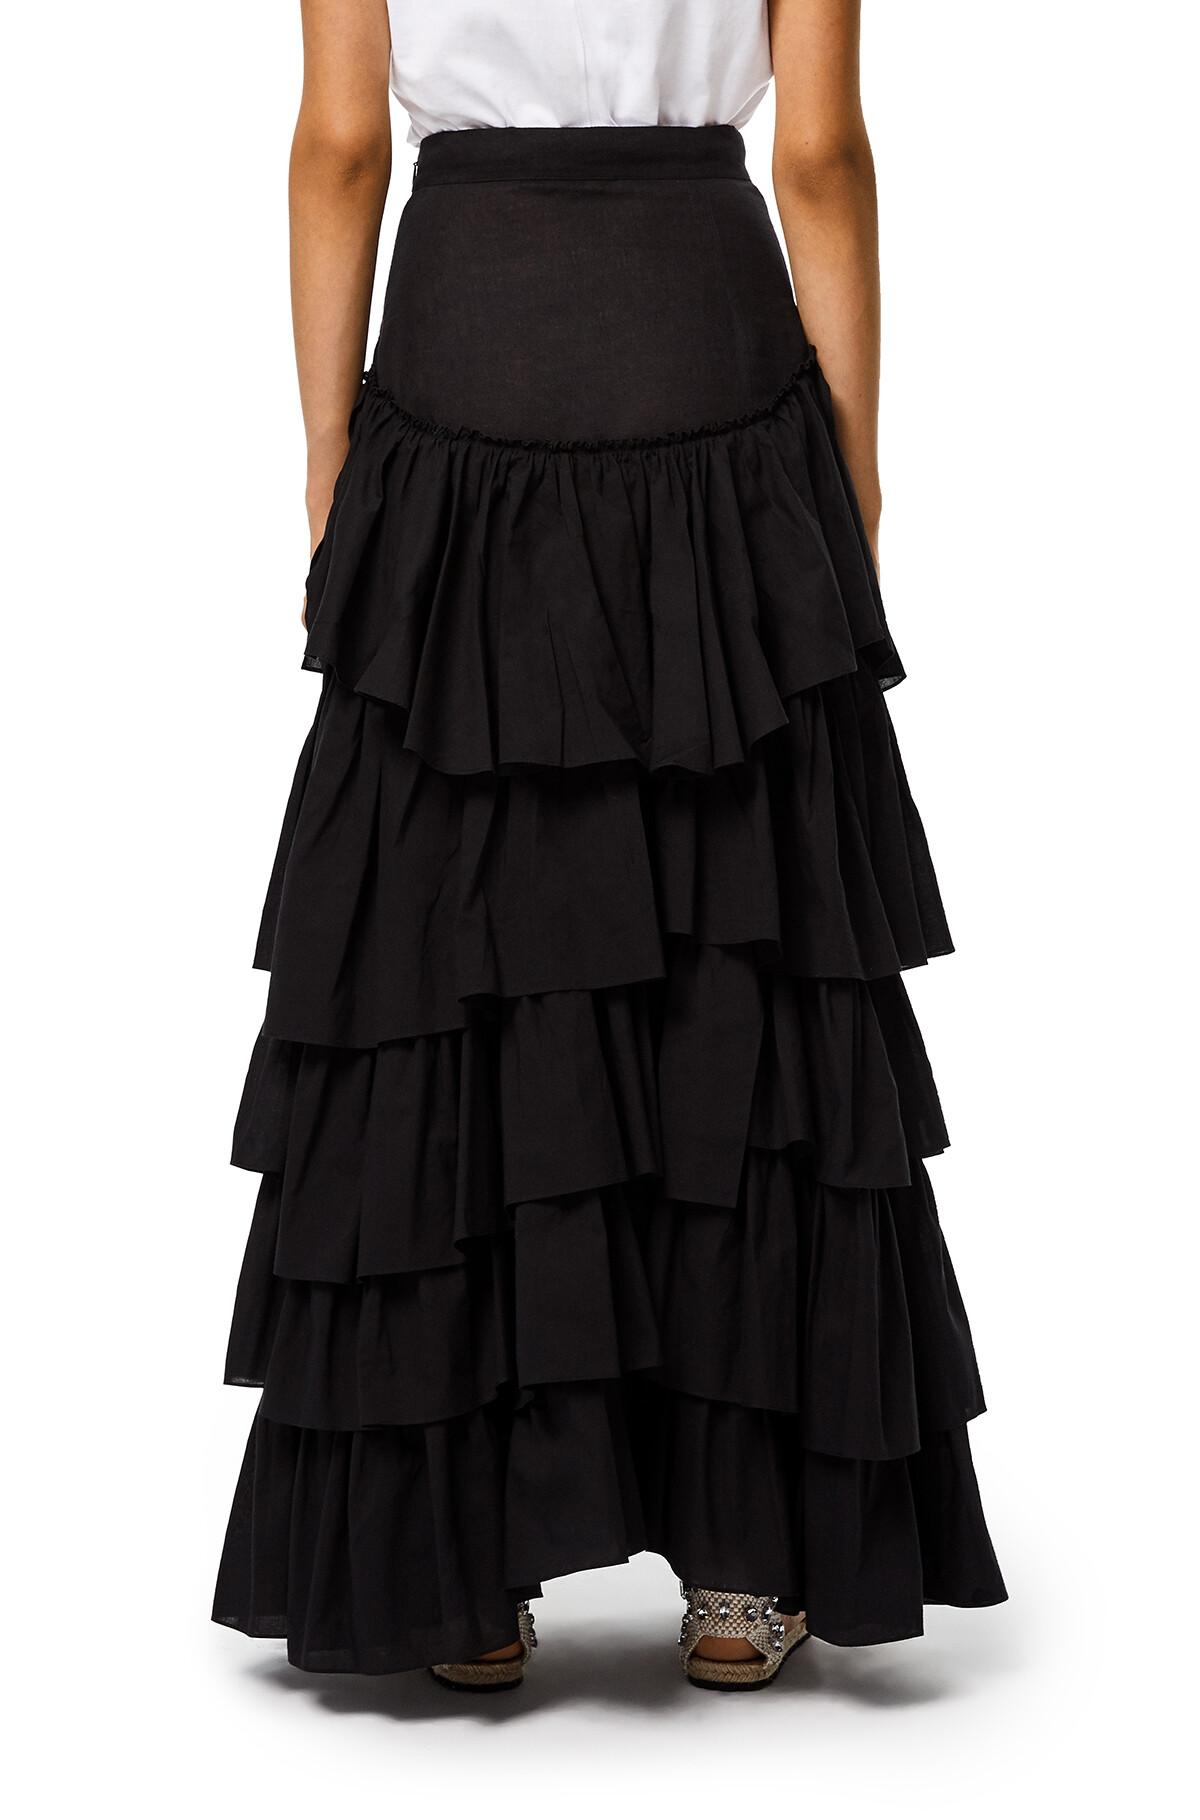 LOEWE Ruffle Skirt In Cotton Black front